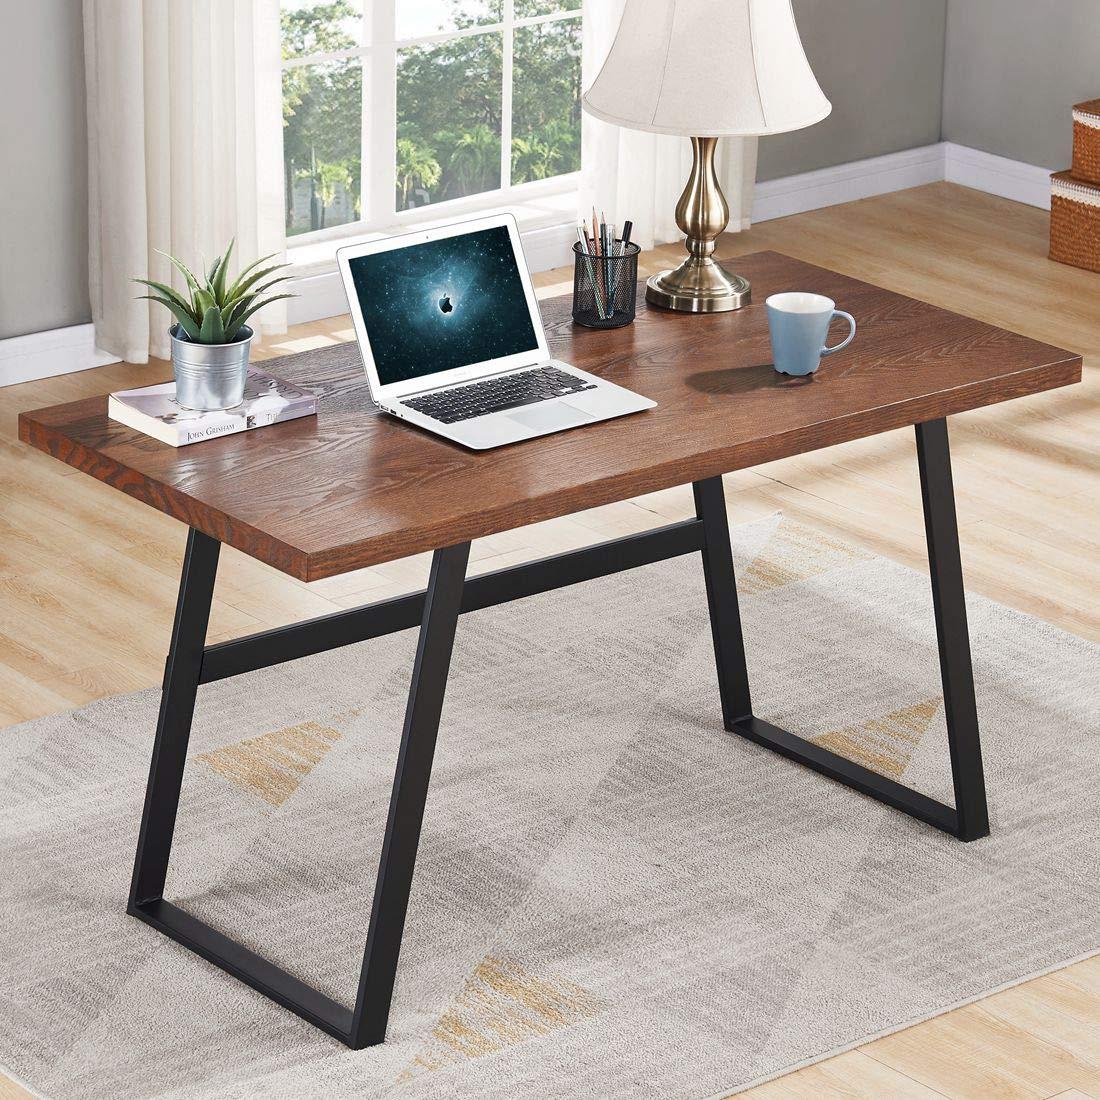 BON AUGURE Rustic Wood Computer Desk, Industrial PC Writing Desk, Vintage Study Table for Home Office Workstation (55 inch, Espresso) by BON AUGURE